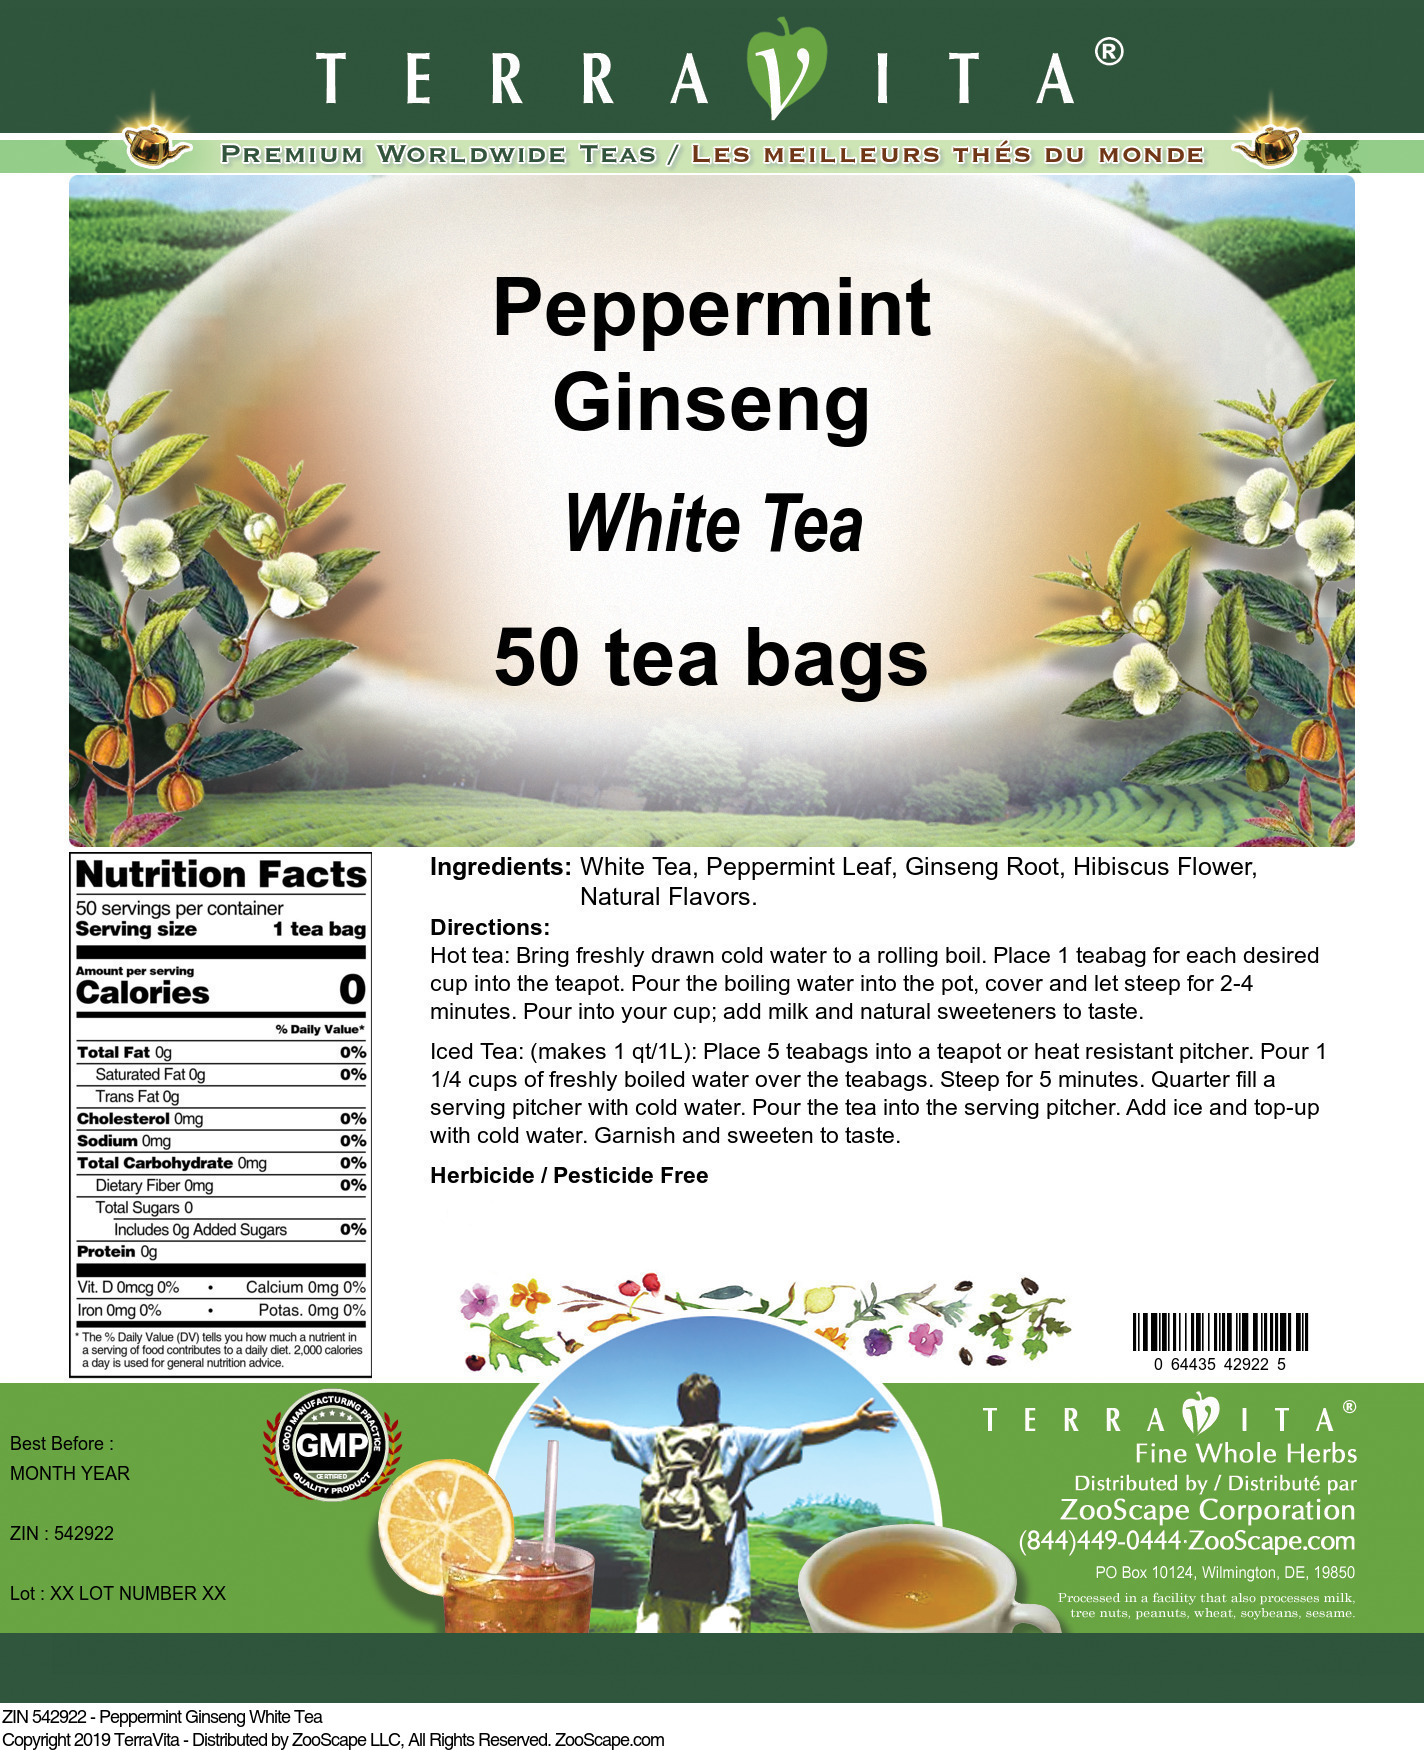 Peppermint Ginseng White Tea